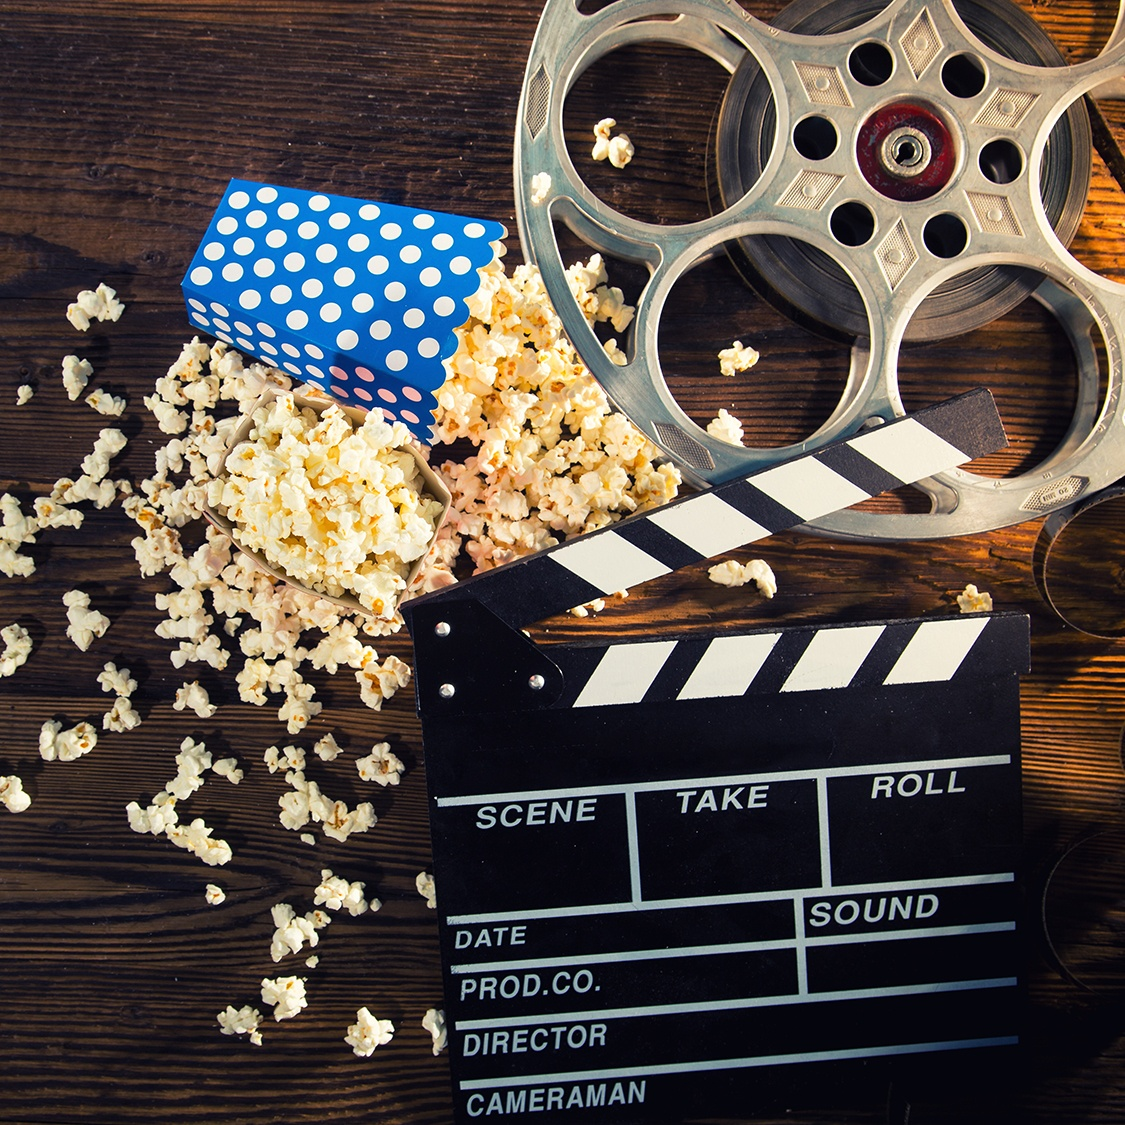 Cinema,Concept,Of,Vintage,Film,Reel,With,Popcorn,On,Old